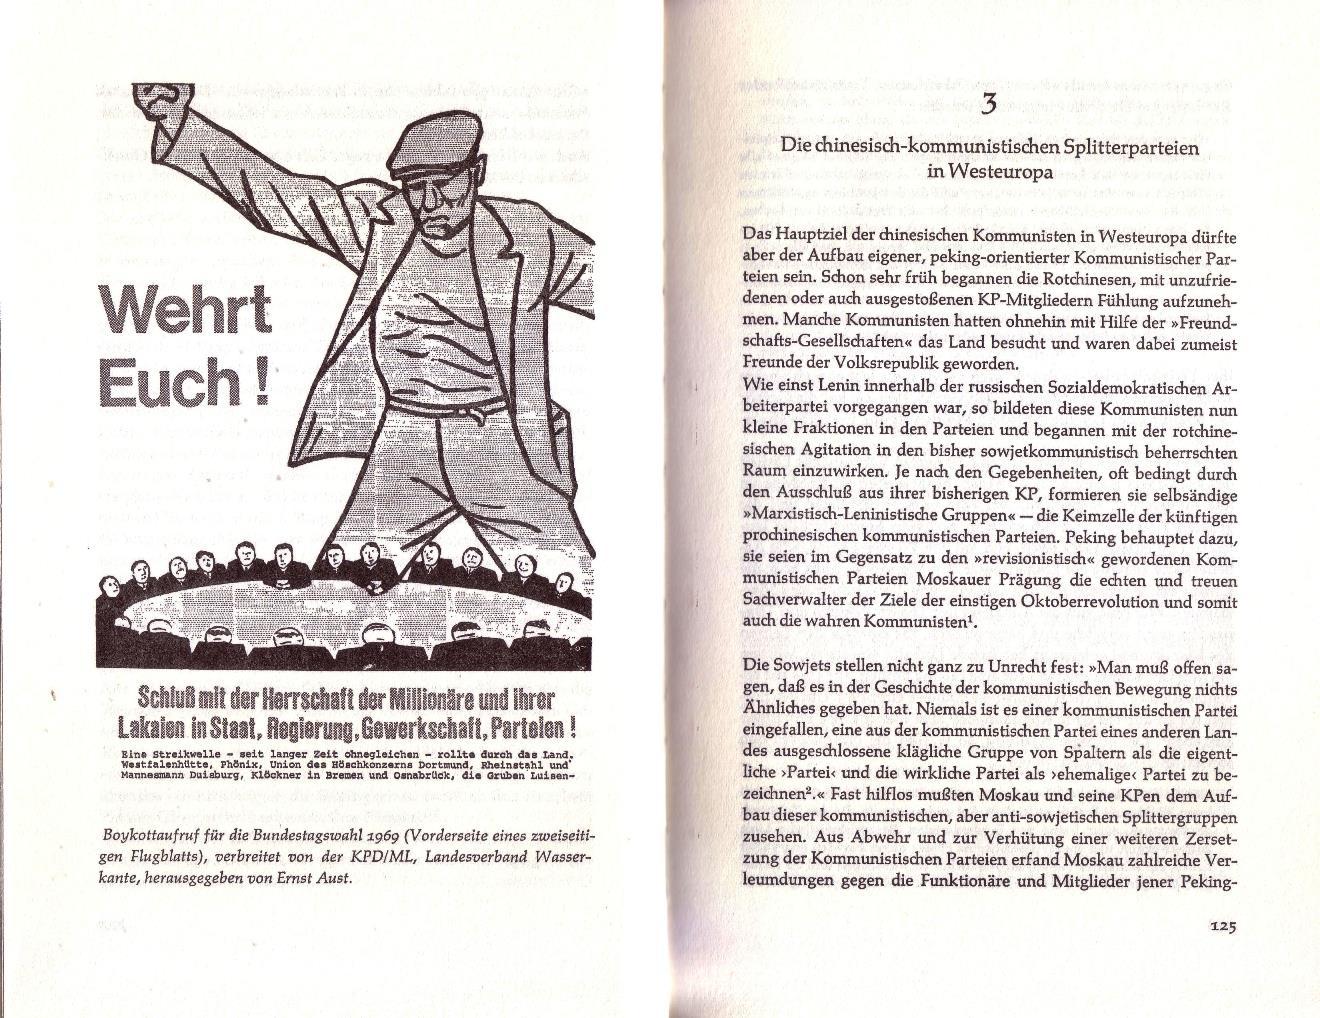 Schlomann_Friedlingstein_Die_Maoisten_0065